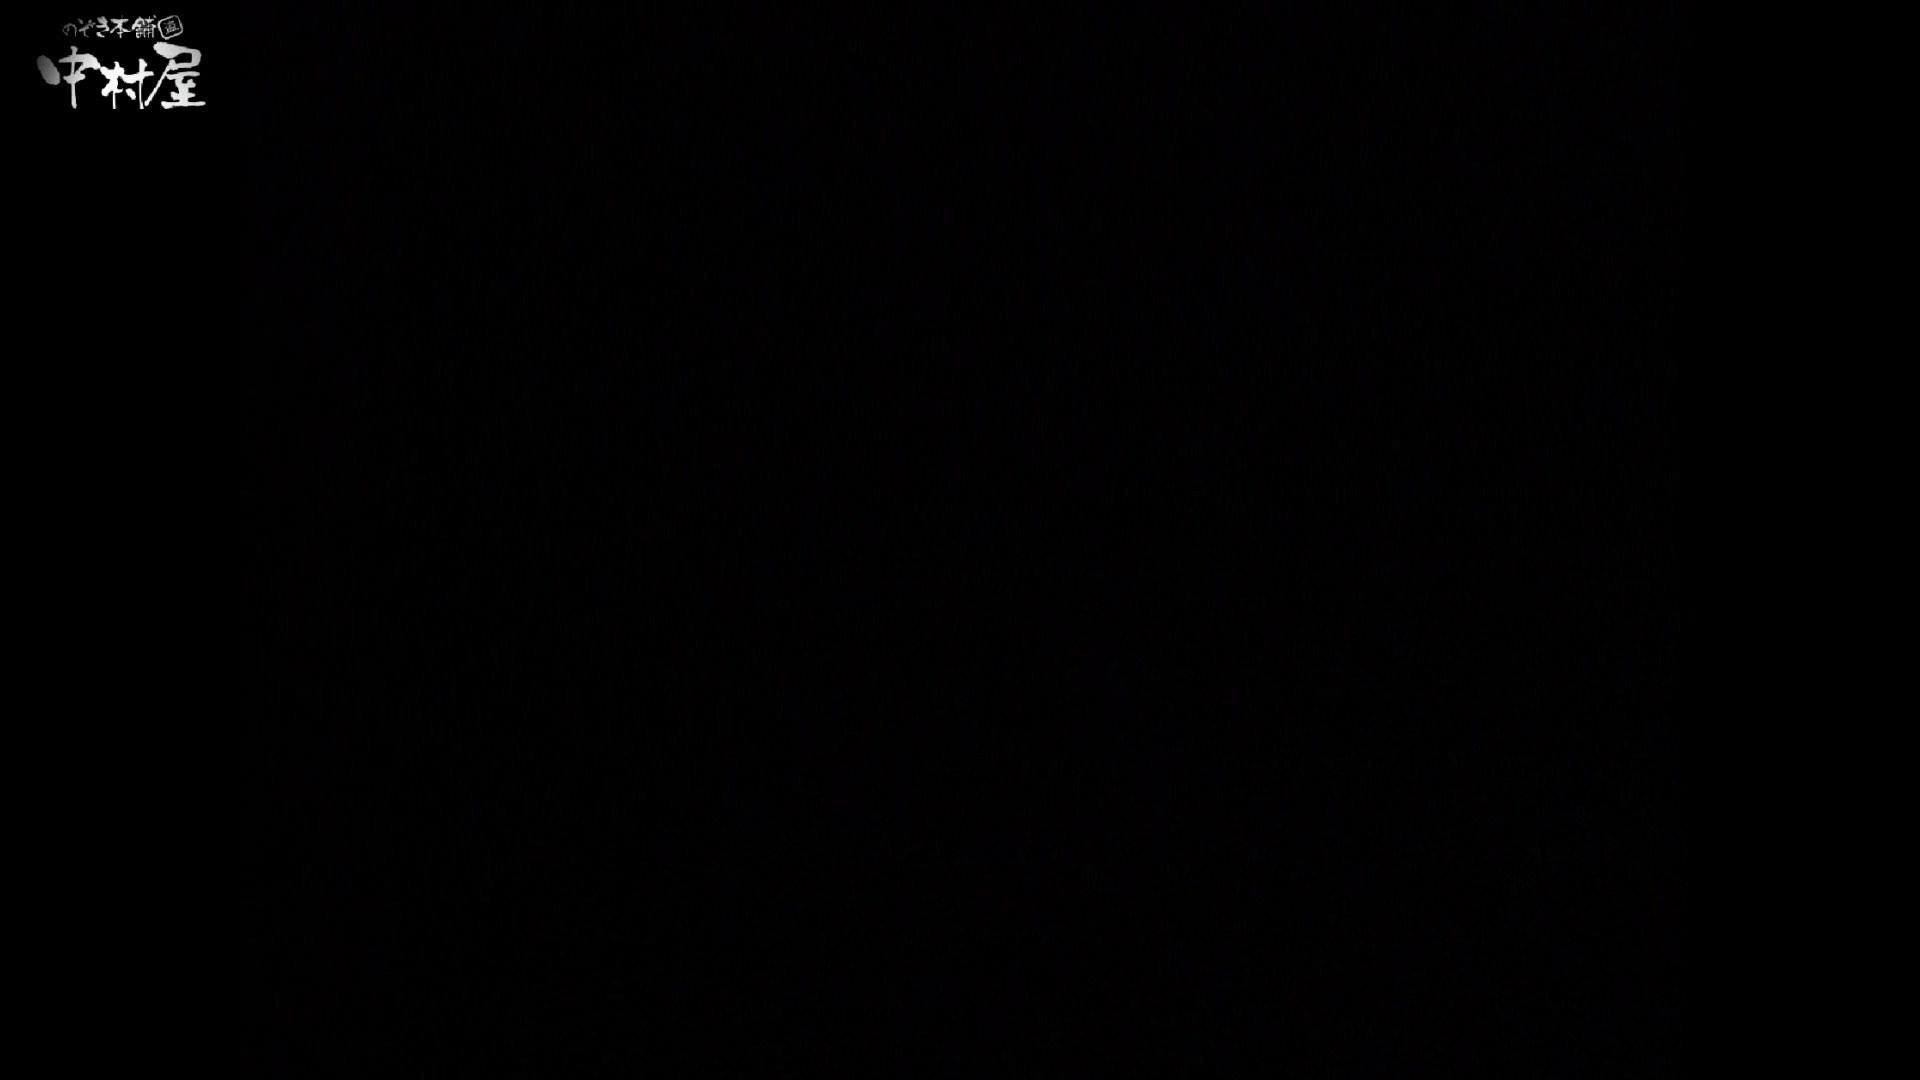 民家風呂専門盗撮師の超危険映像 vol.016 お色気美少女 エロ無料画像 86枚 35